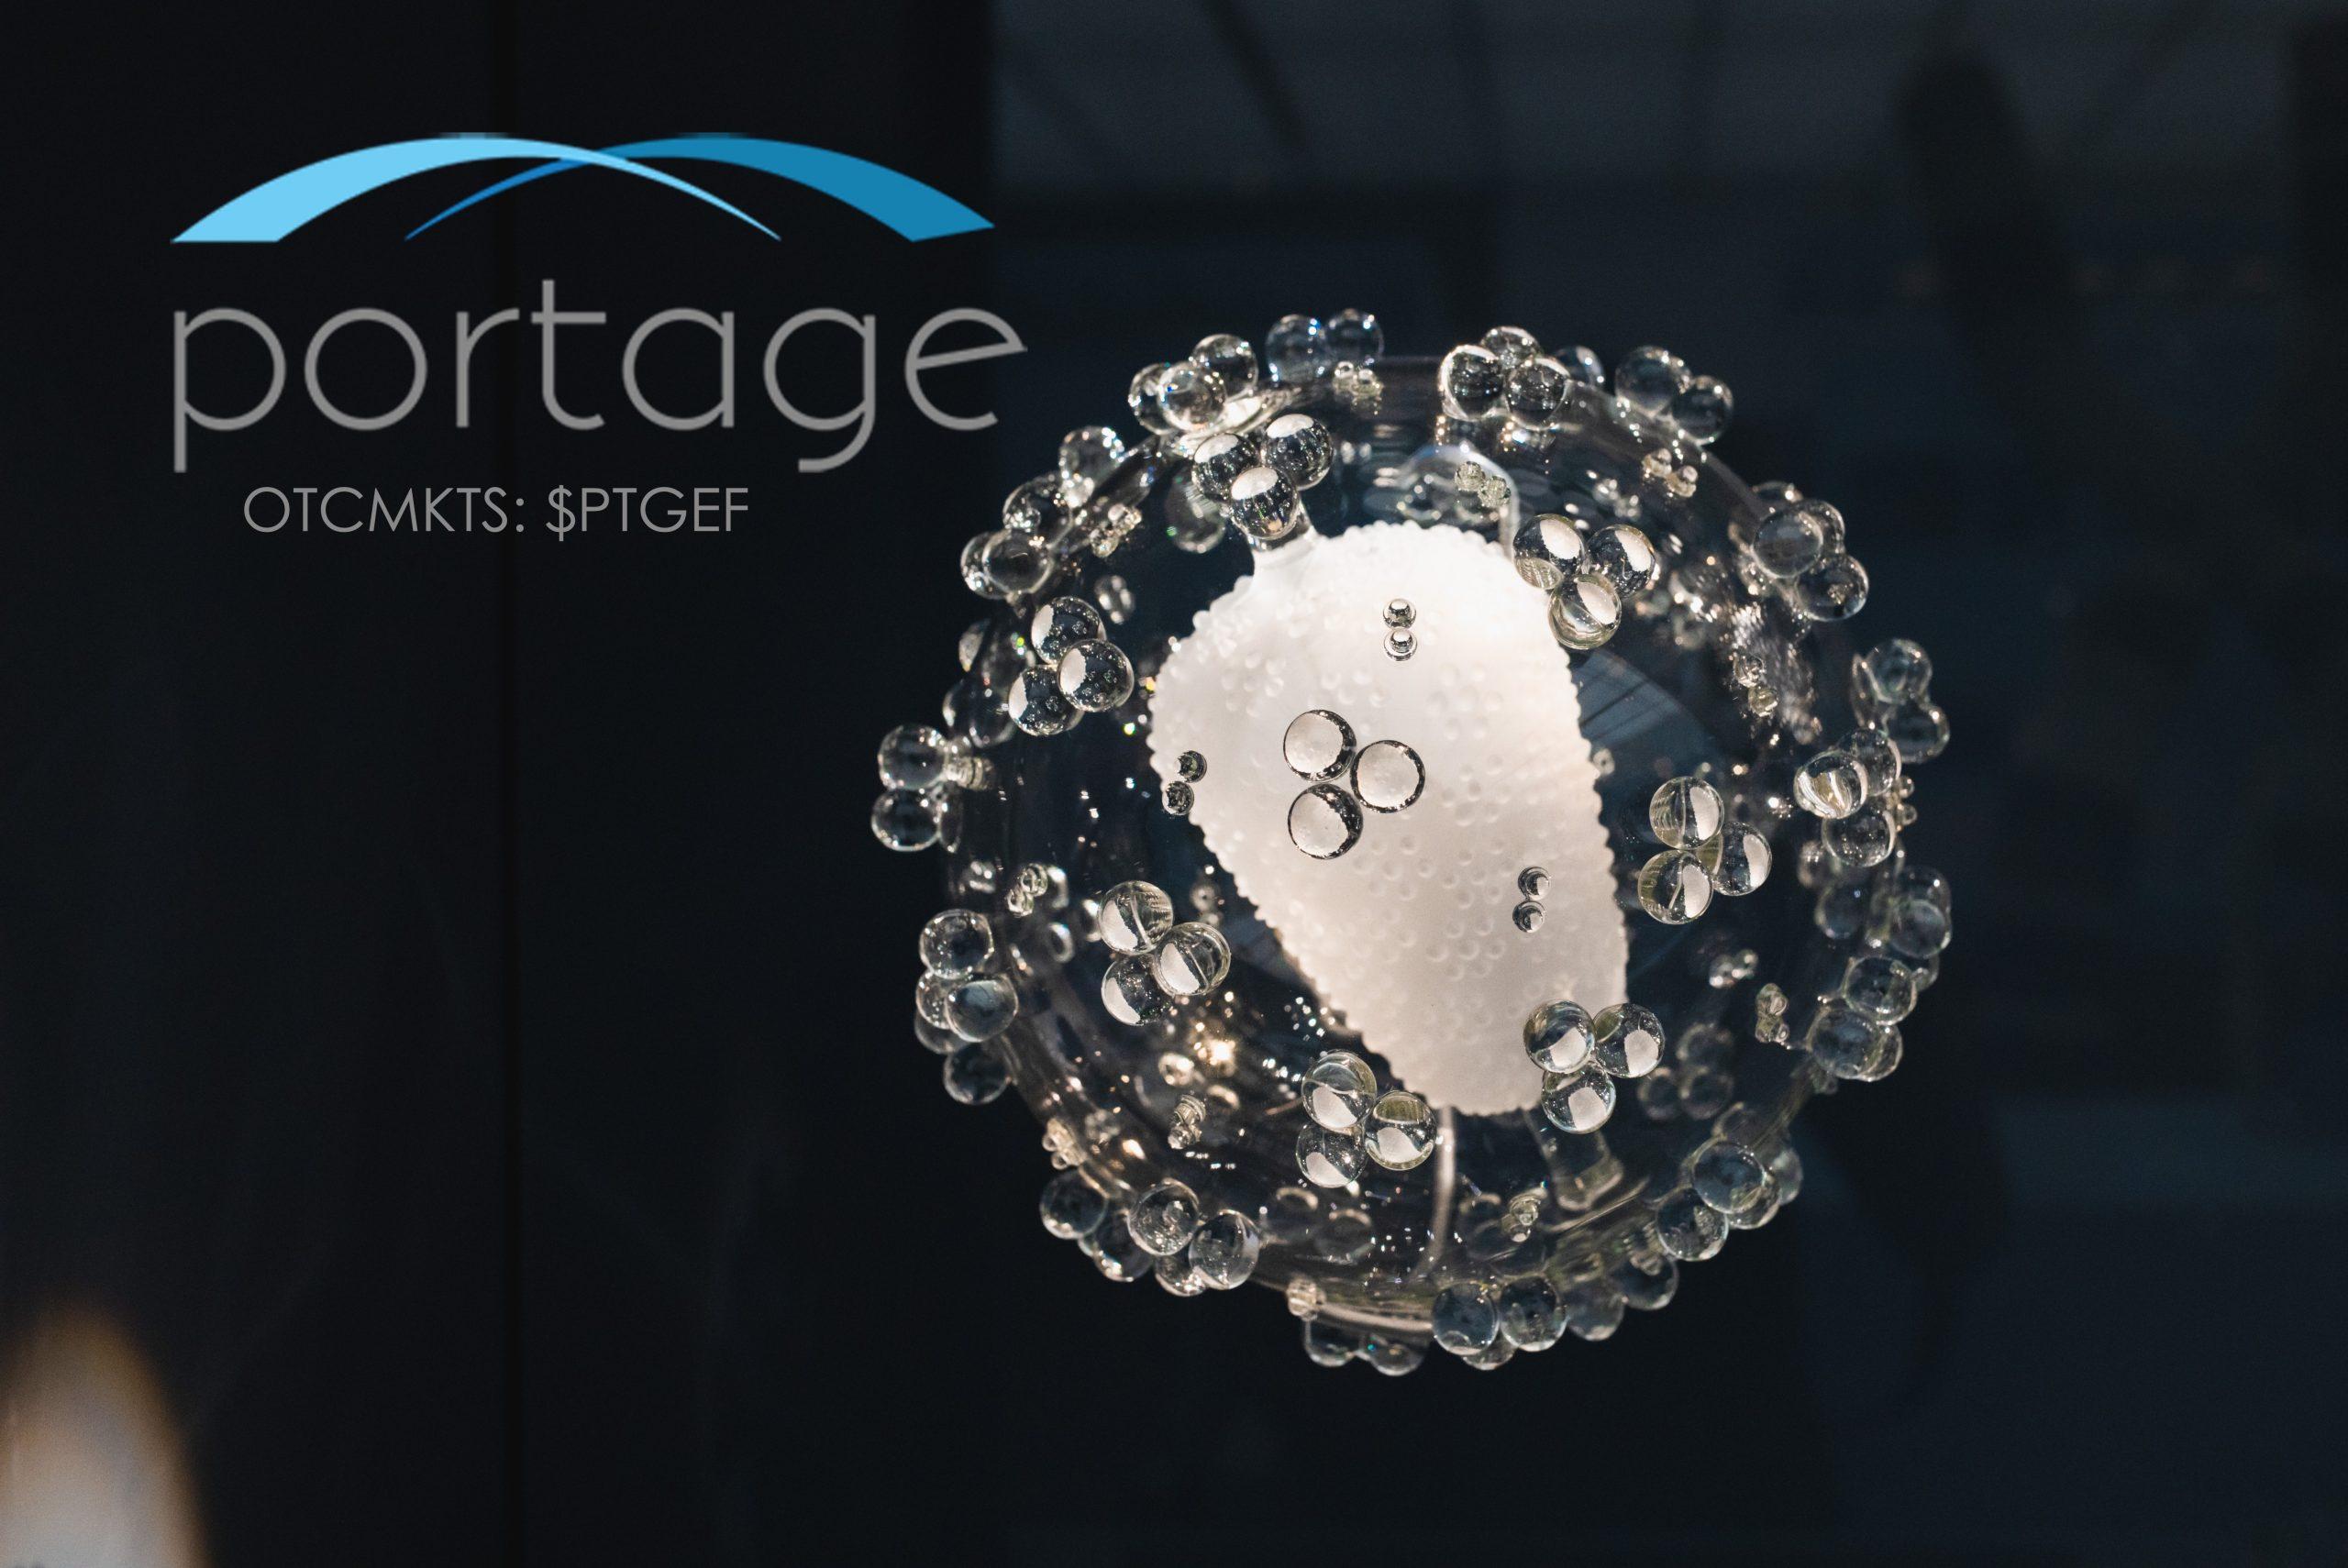 portage-biotech-ptgef-internet-bull-report